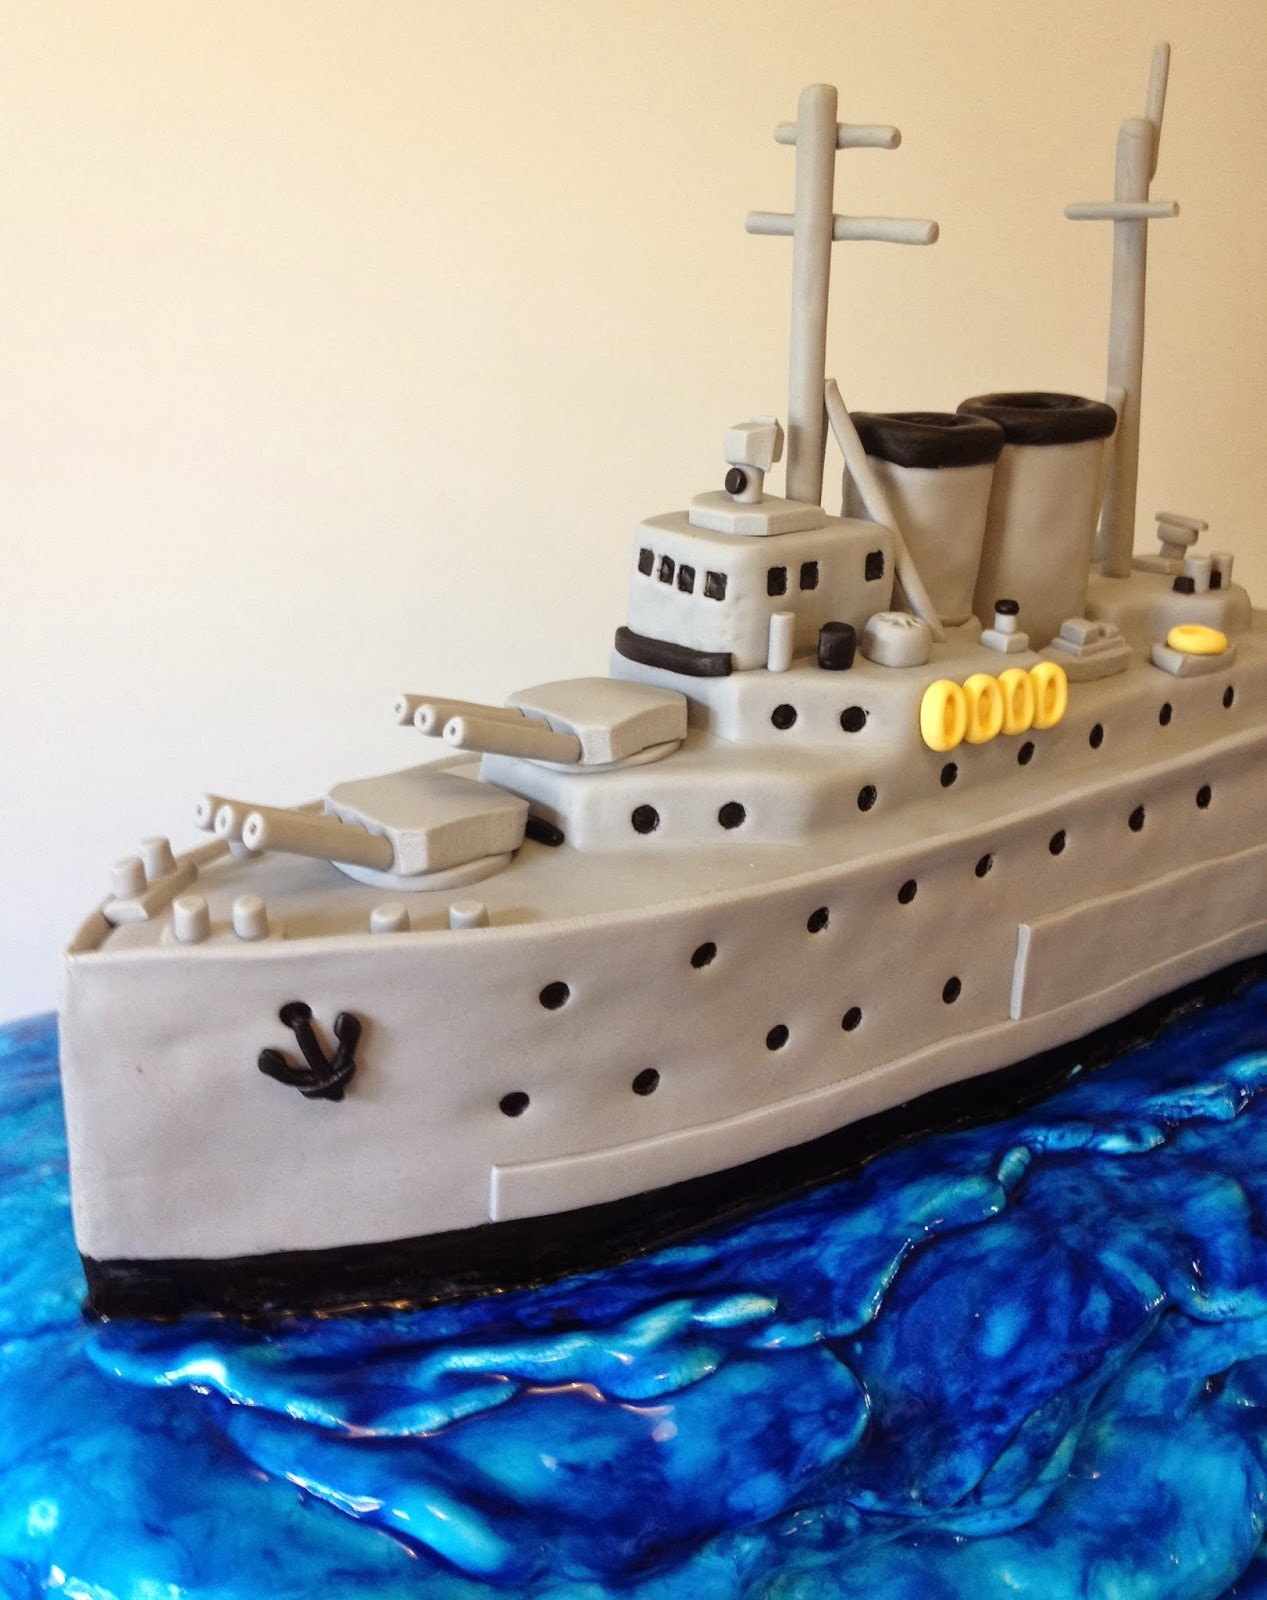 Pleasant 9 Navy Boat Cupcakes Cakes Photo Navy Ship Birthday Cake Us Funny Birthday Cards Online Inifofree Goldxyz